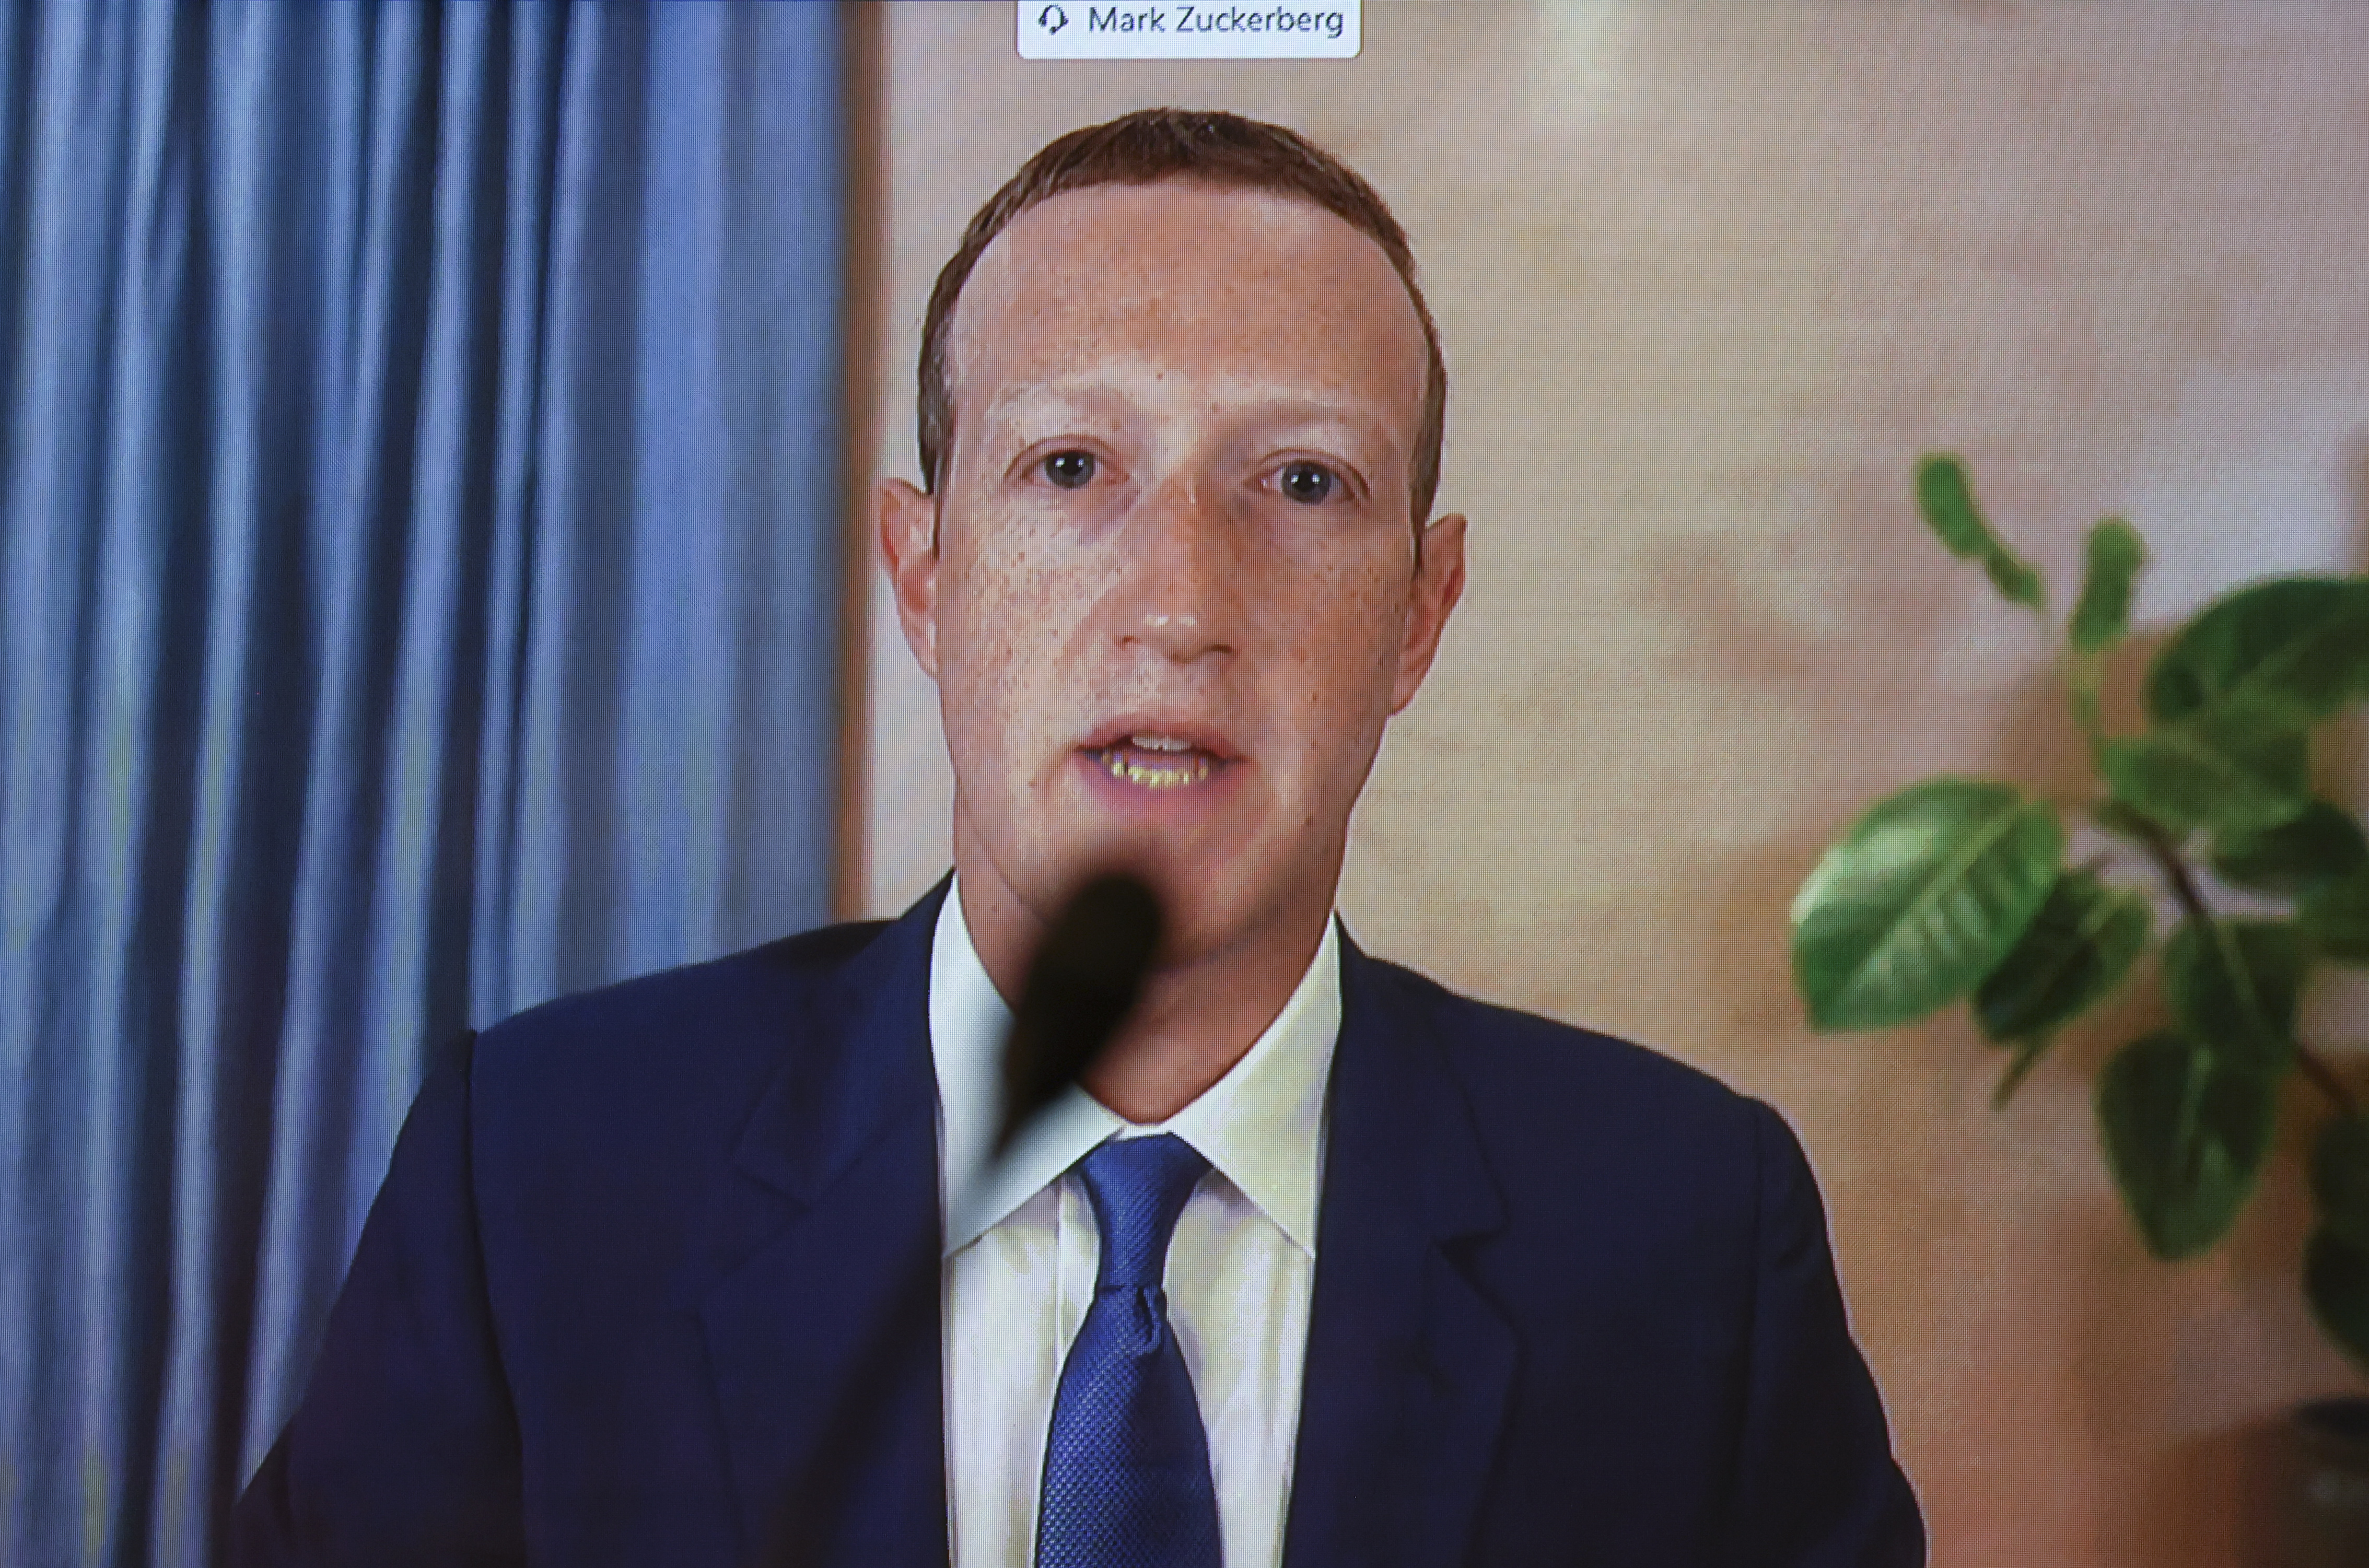 A screenshot of Mark Zuckerberg talking into a microphone via videochat.